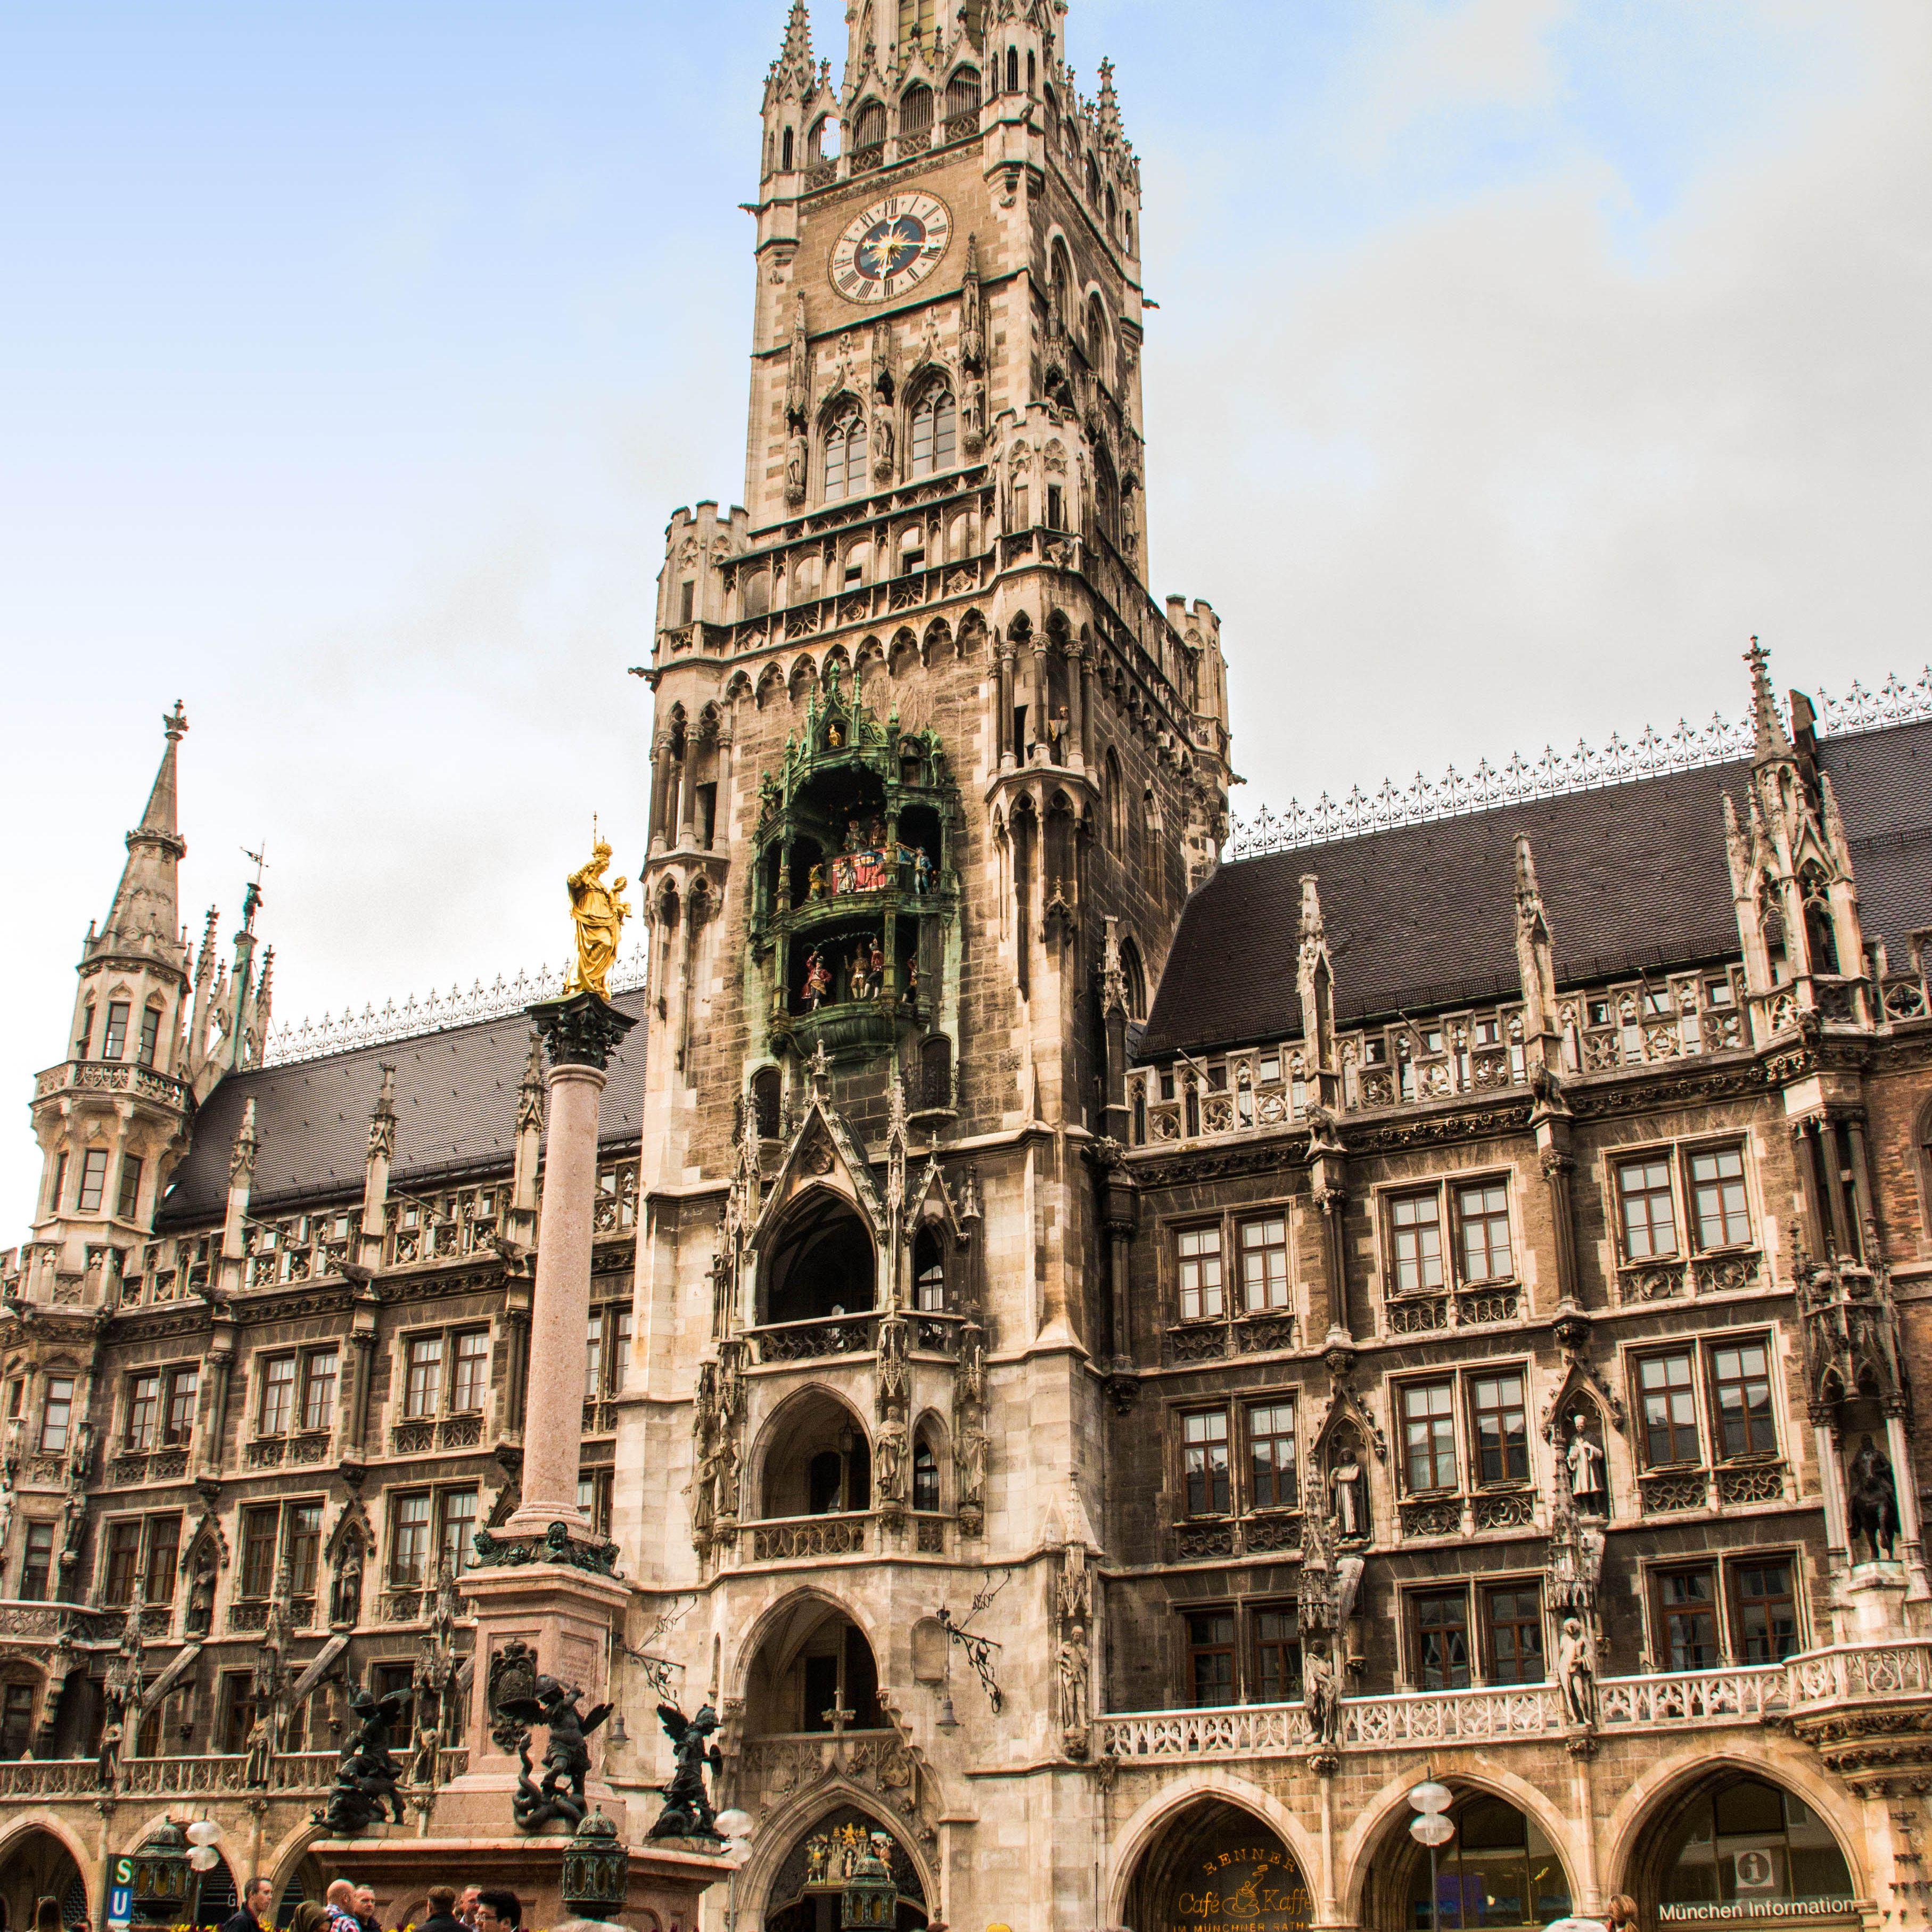 City Hall building of Munich